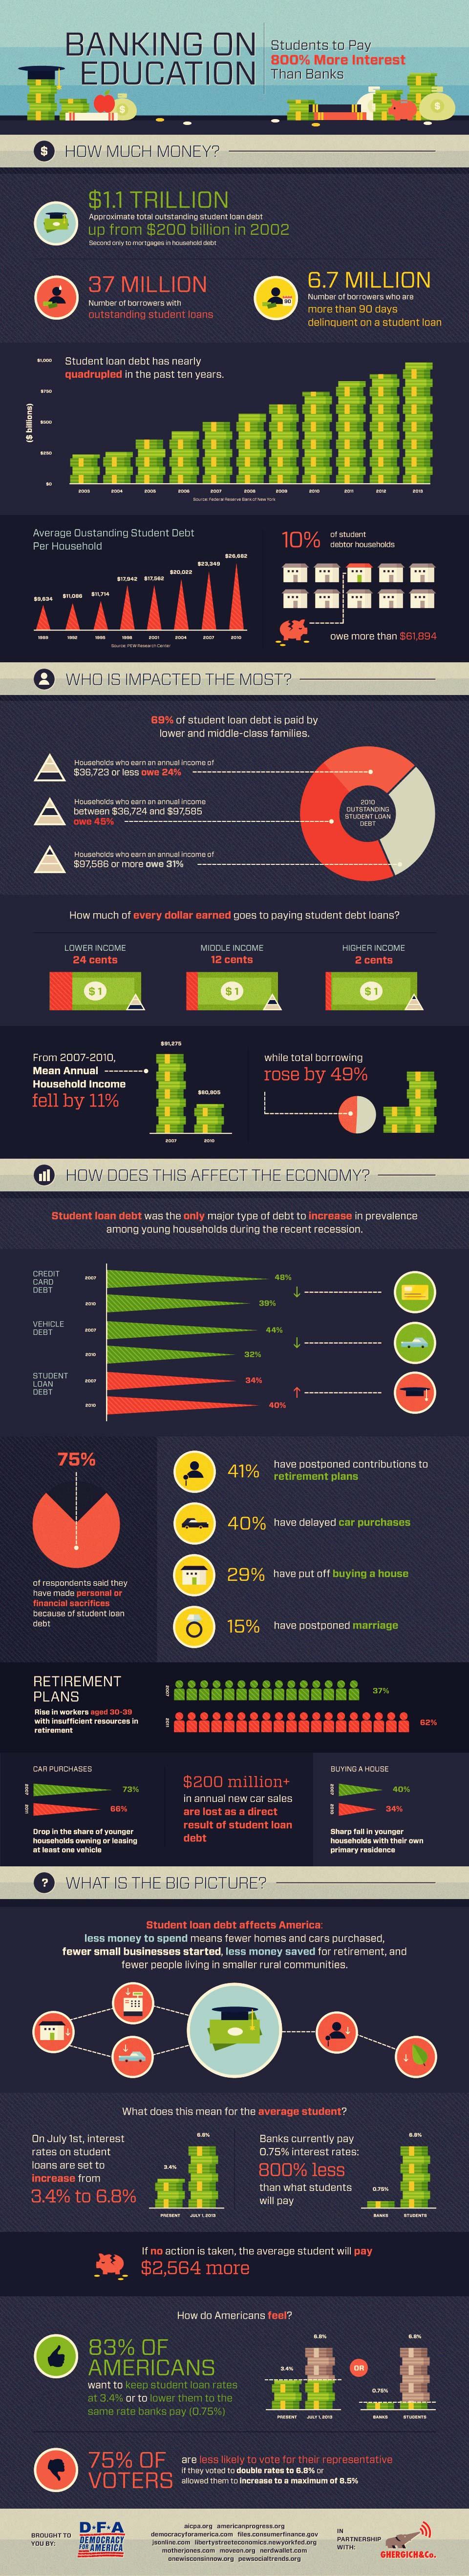 US Student Loan Debt Crisis-Infographic